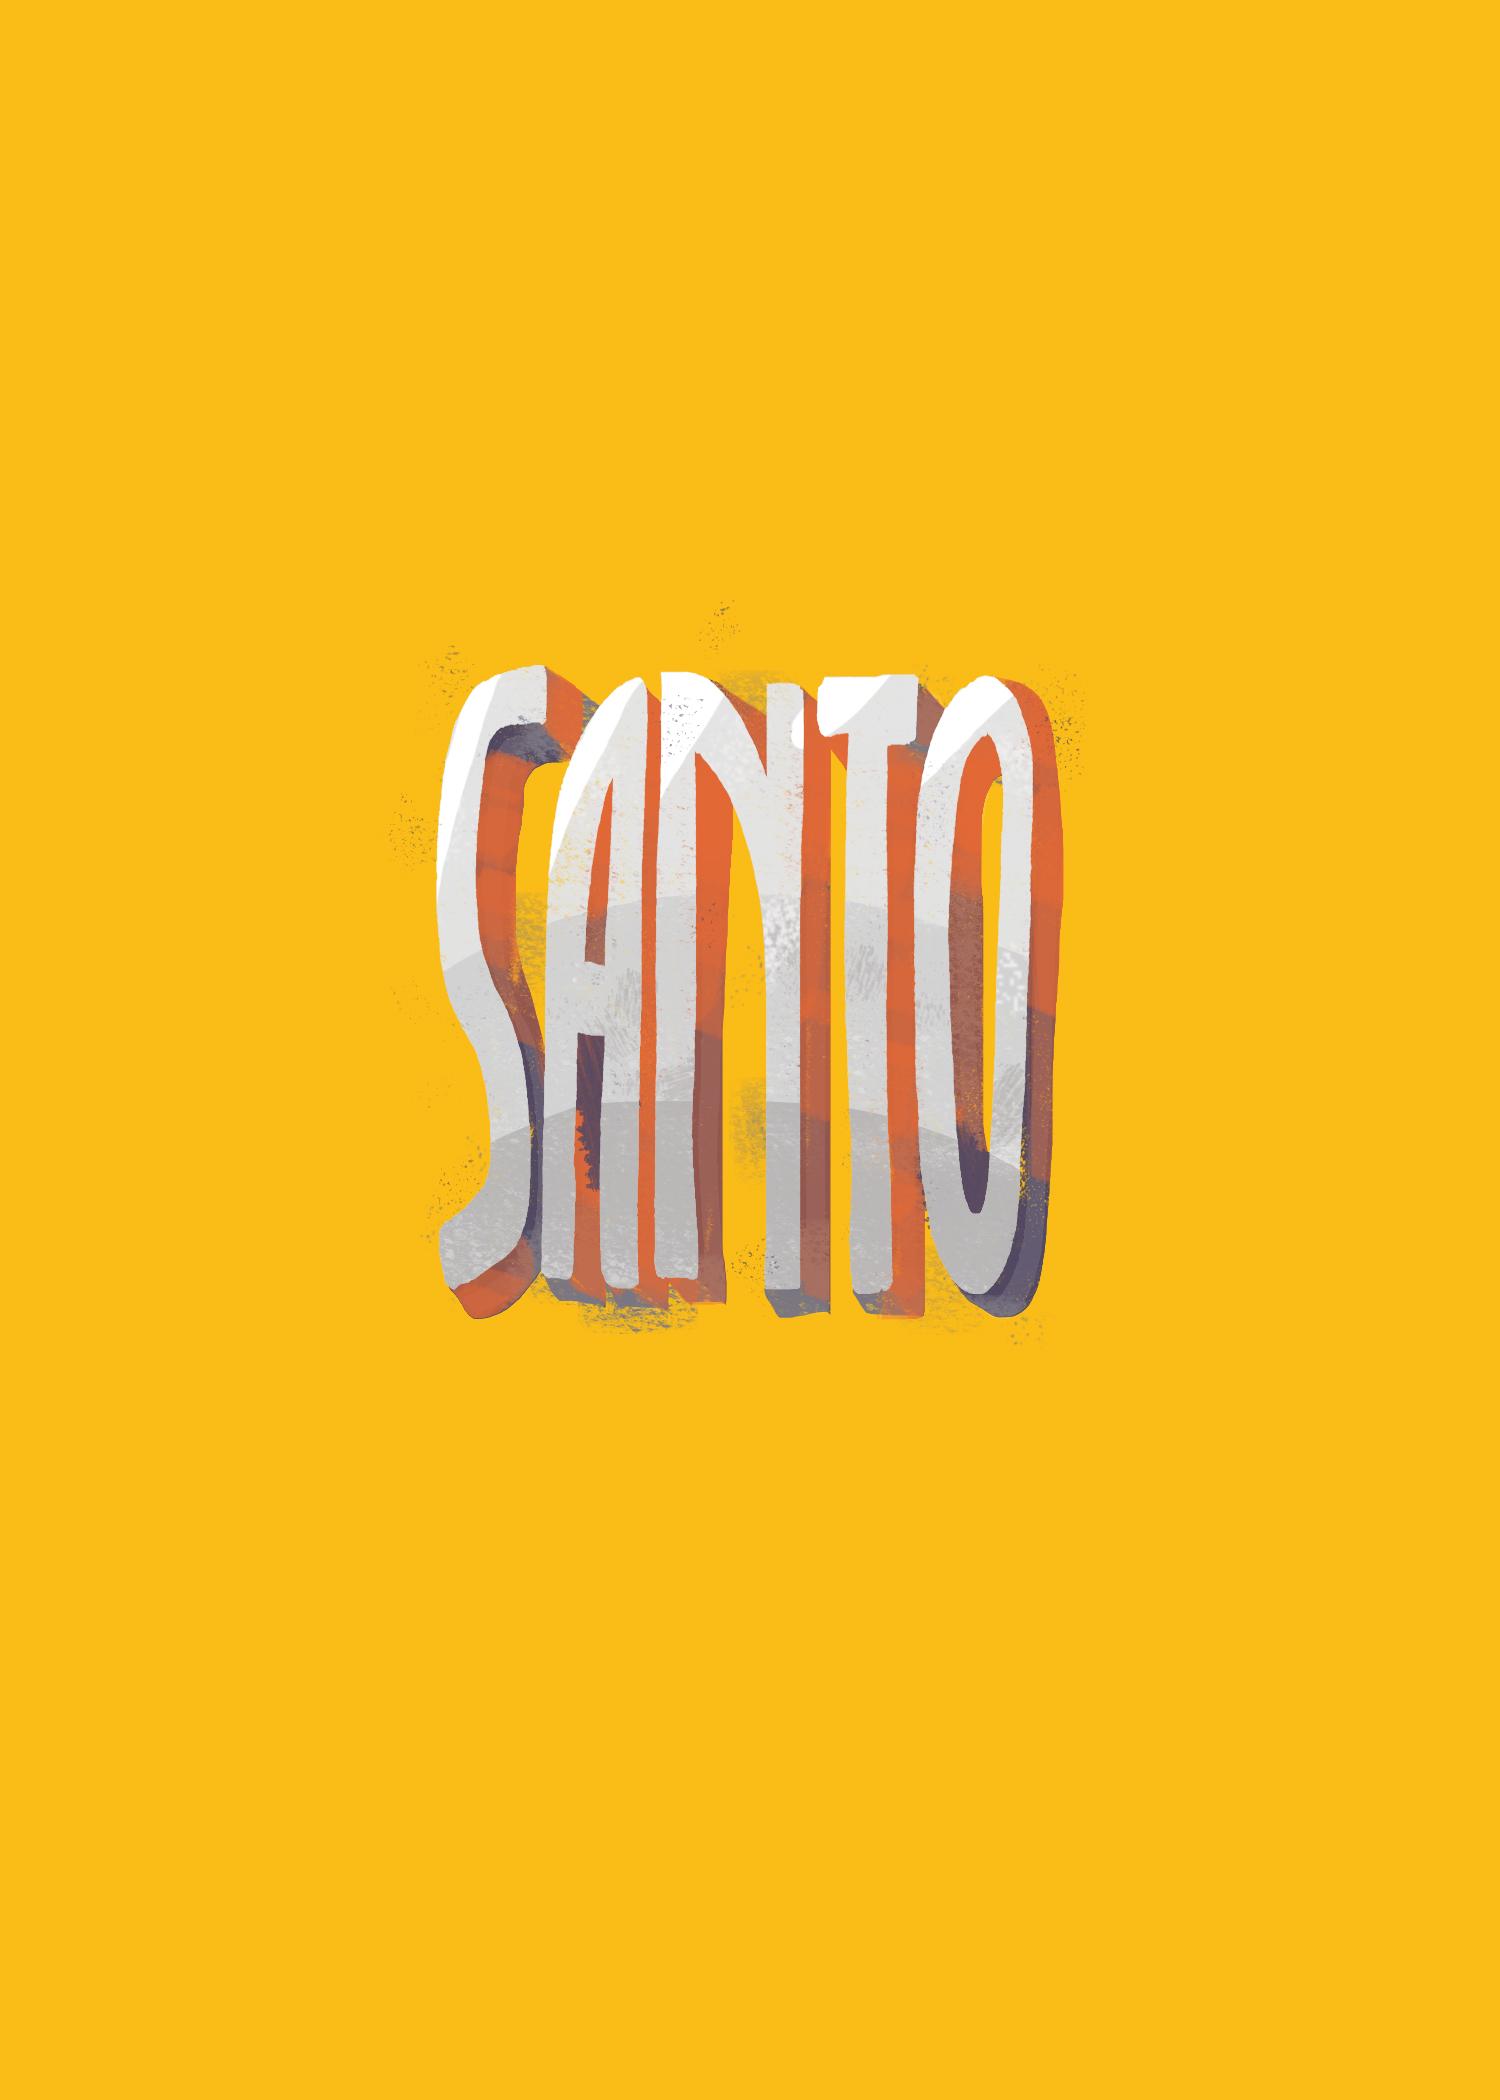 5.Santo_STRONGYELLOW.jpg